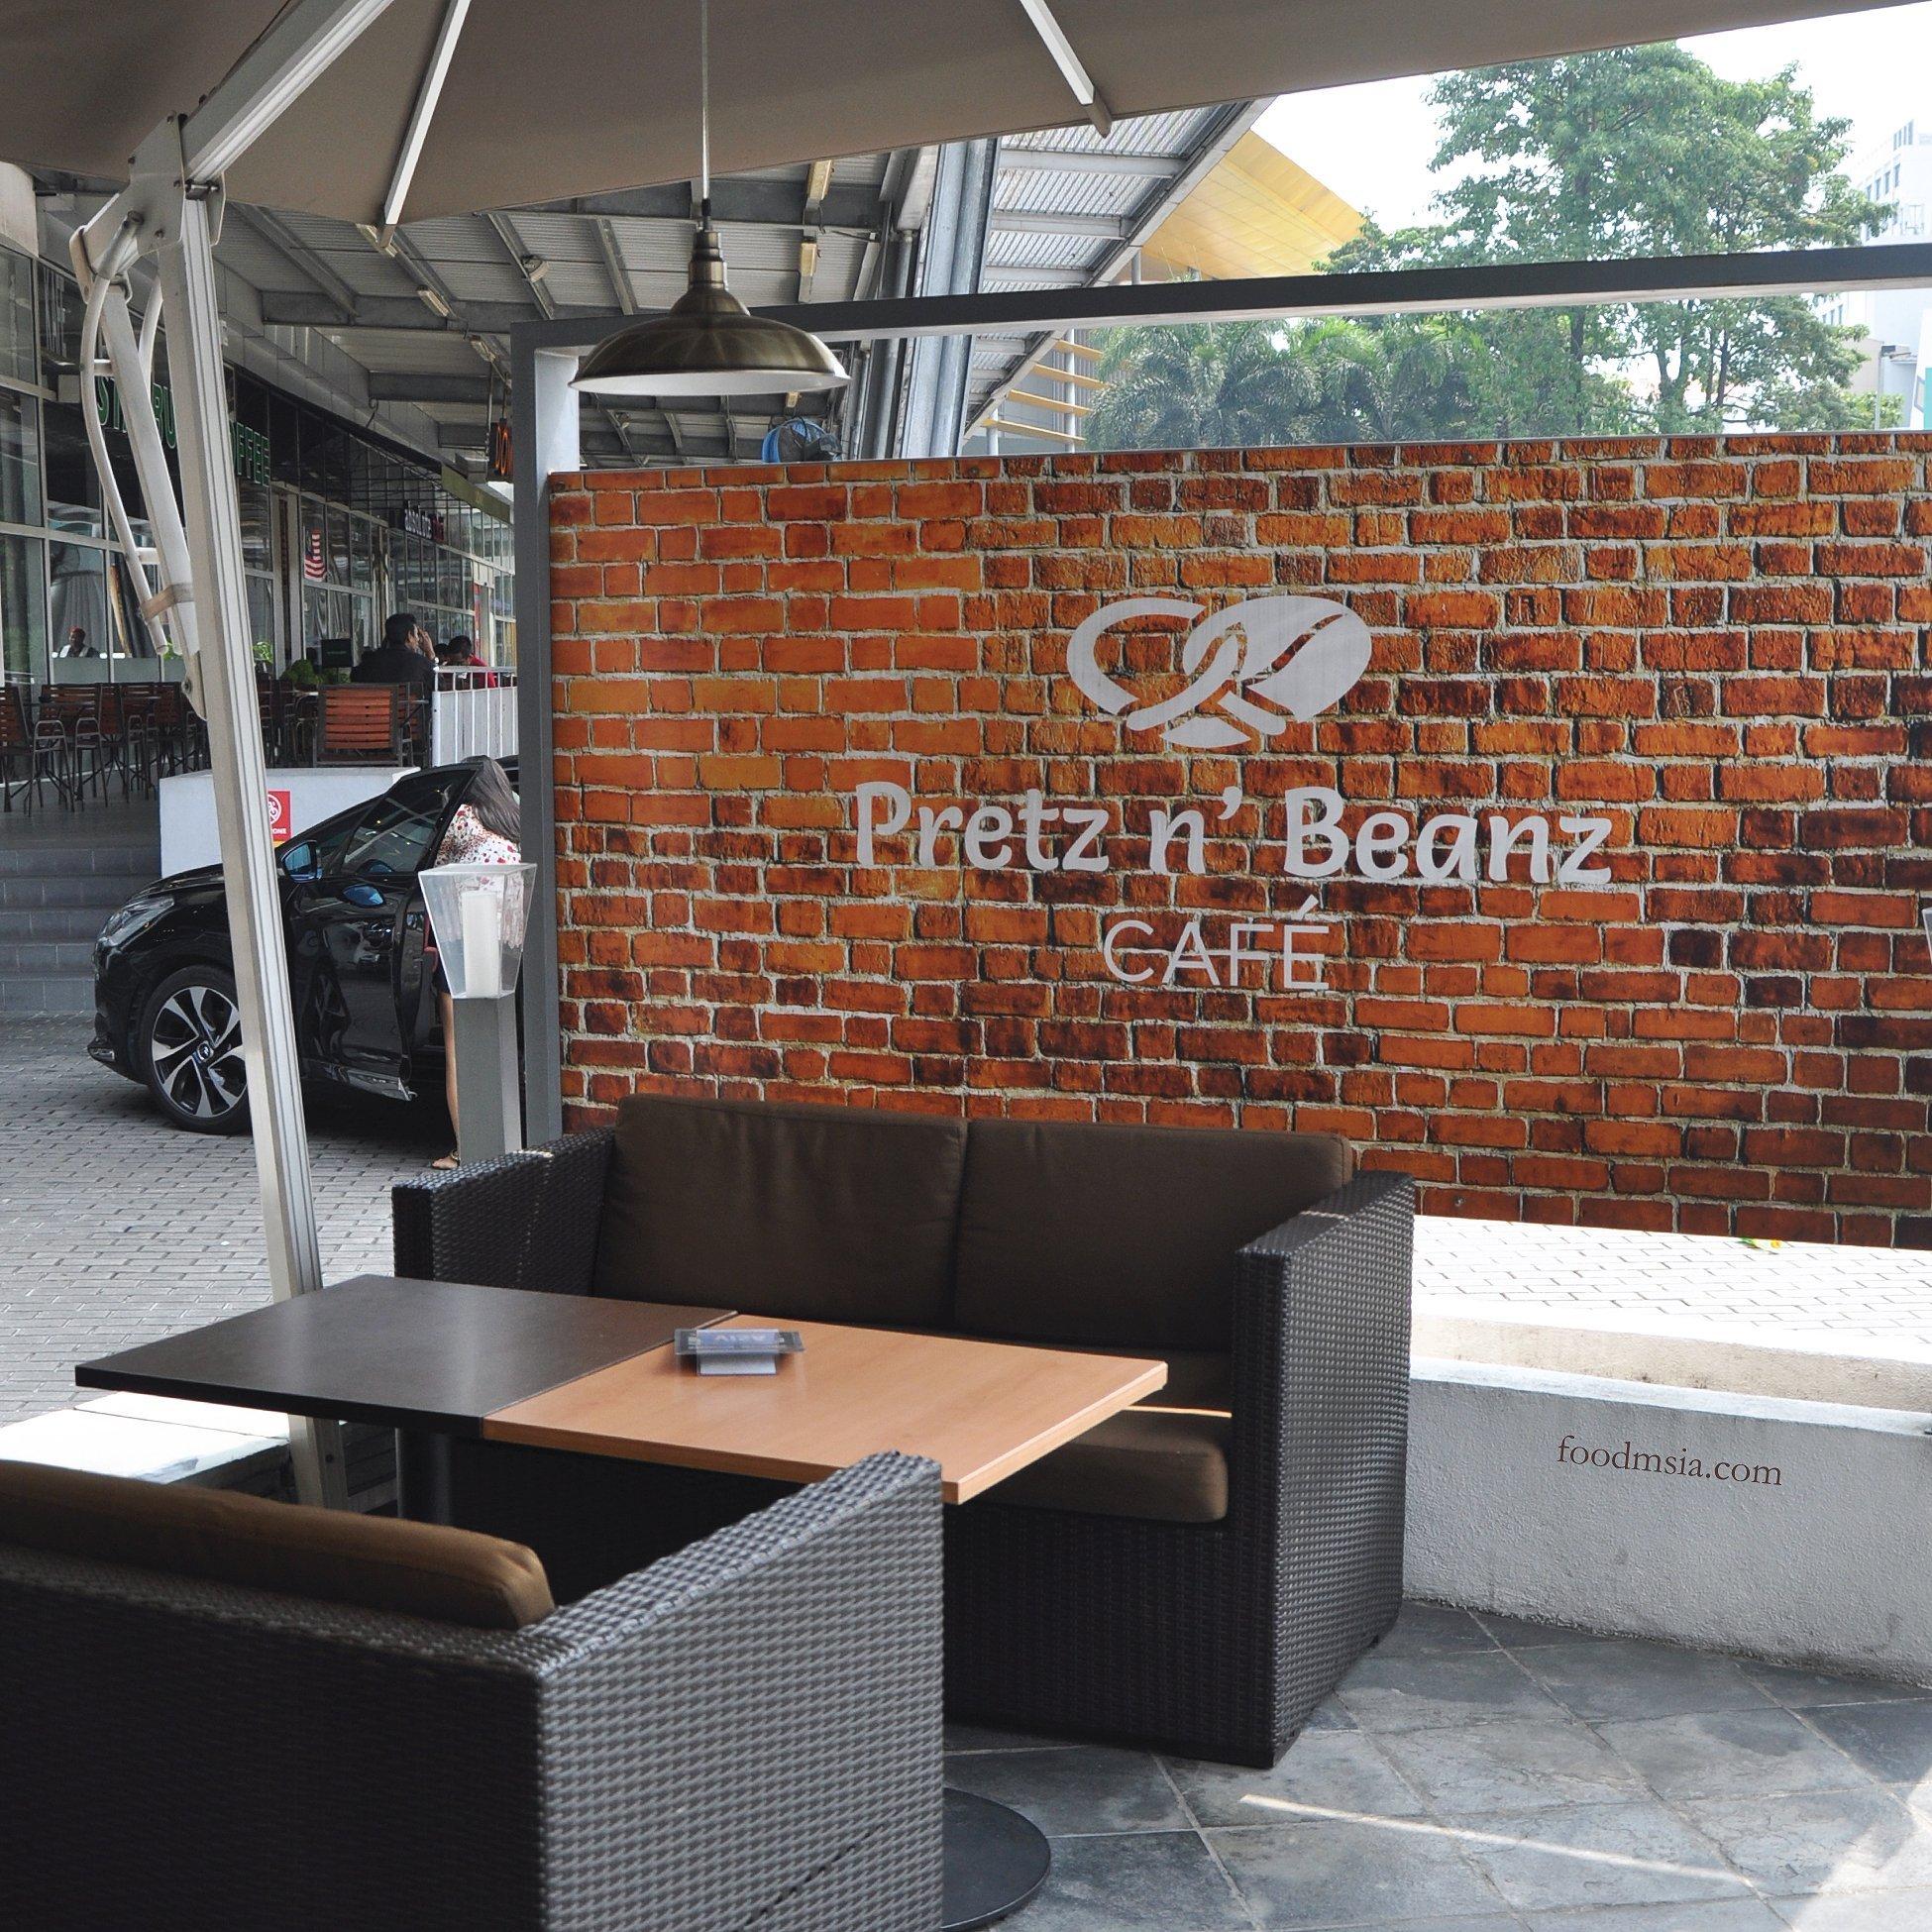 Pretz n' Beanz Cafe @ IPC Shopping Centre, Mutiara Damansara